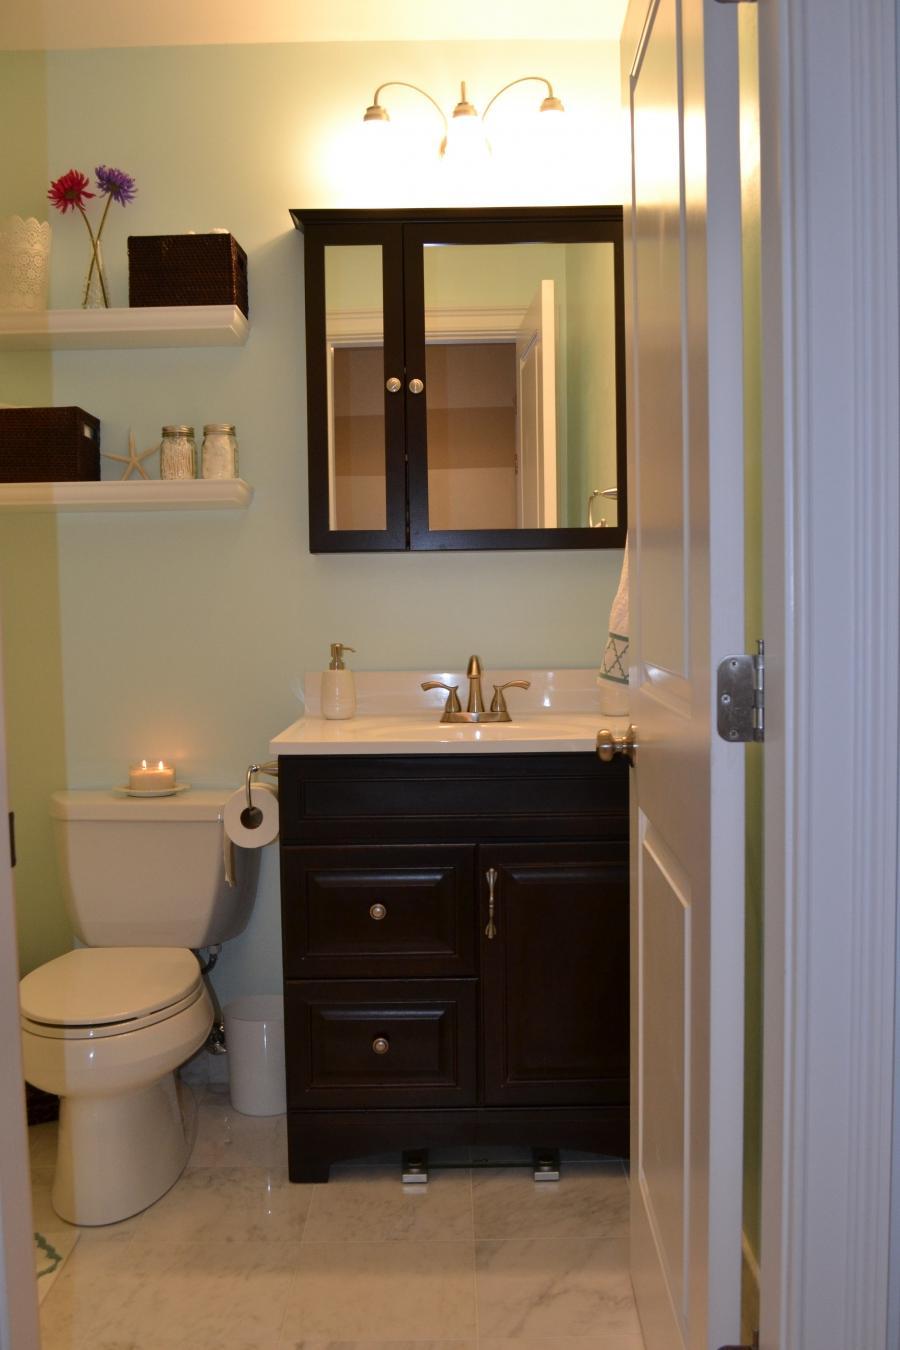 Half bathroom decorating ideas photos - How to decorate a half bath ...